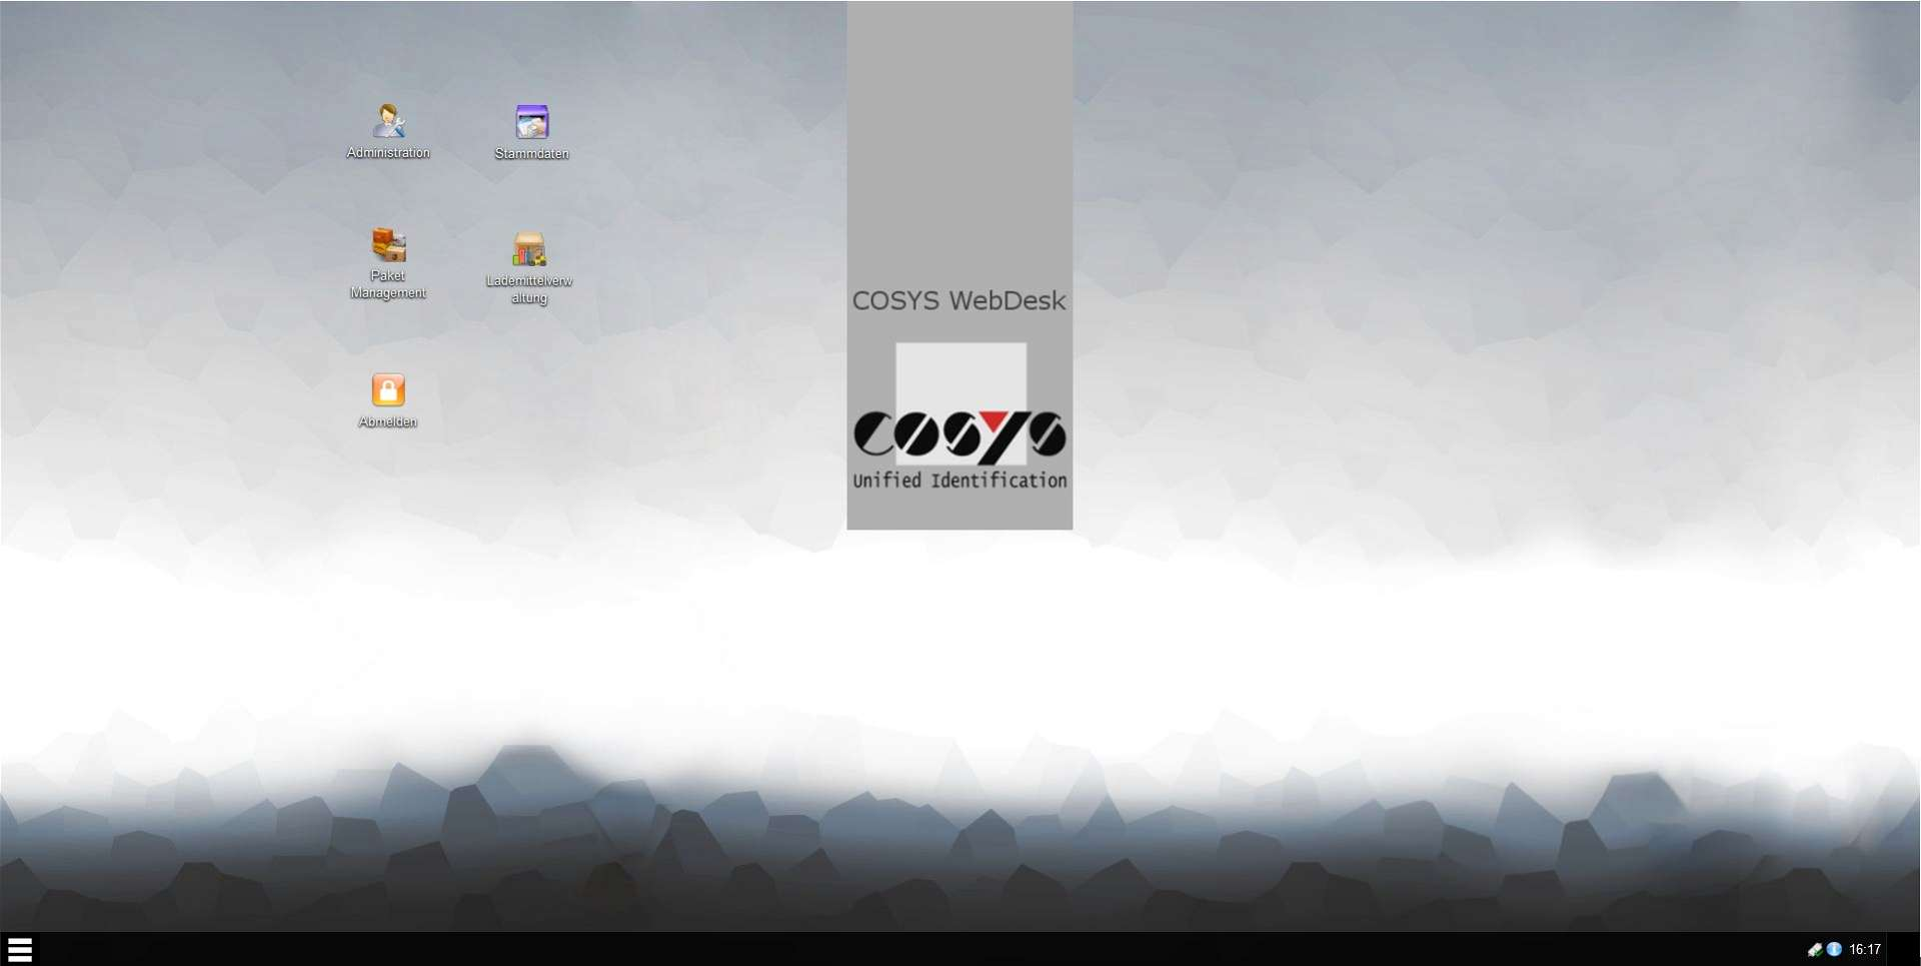 COSYS WebDesk Transport